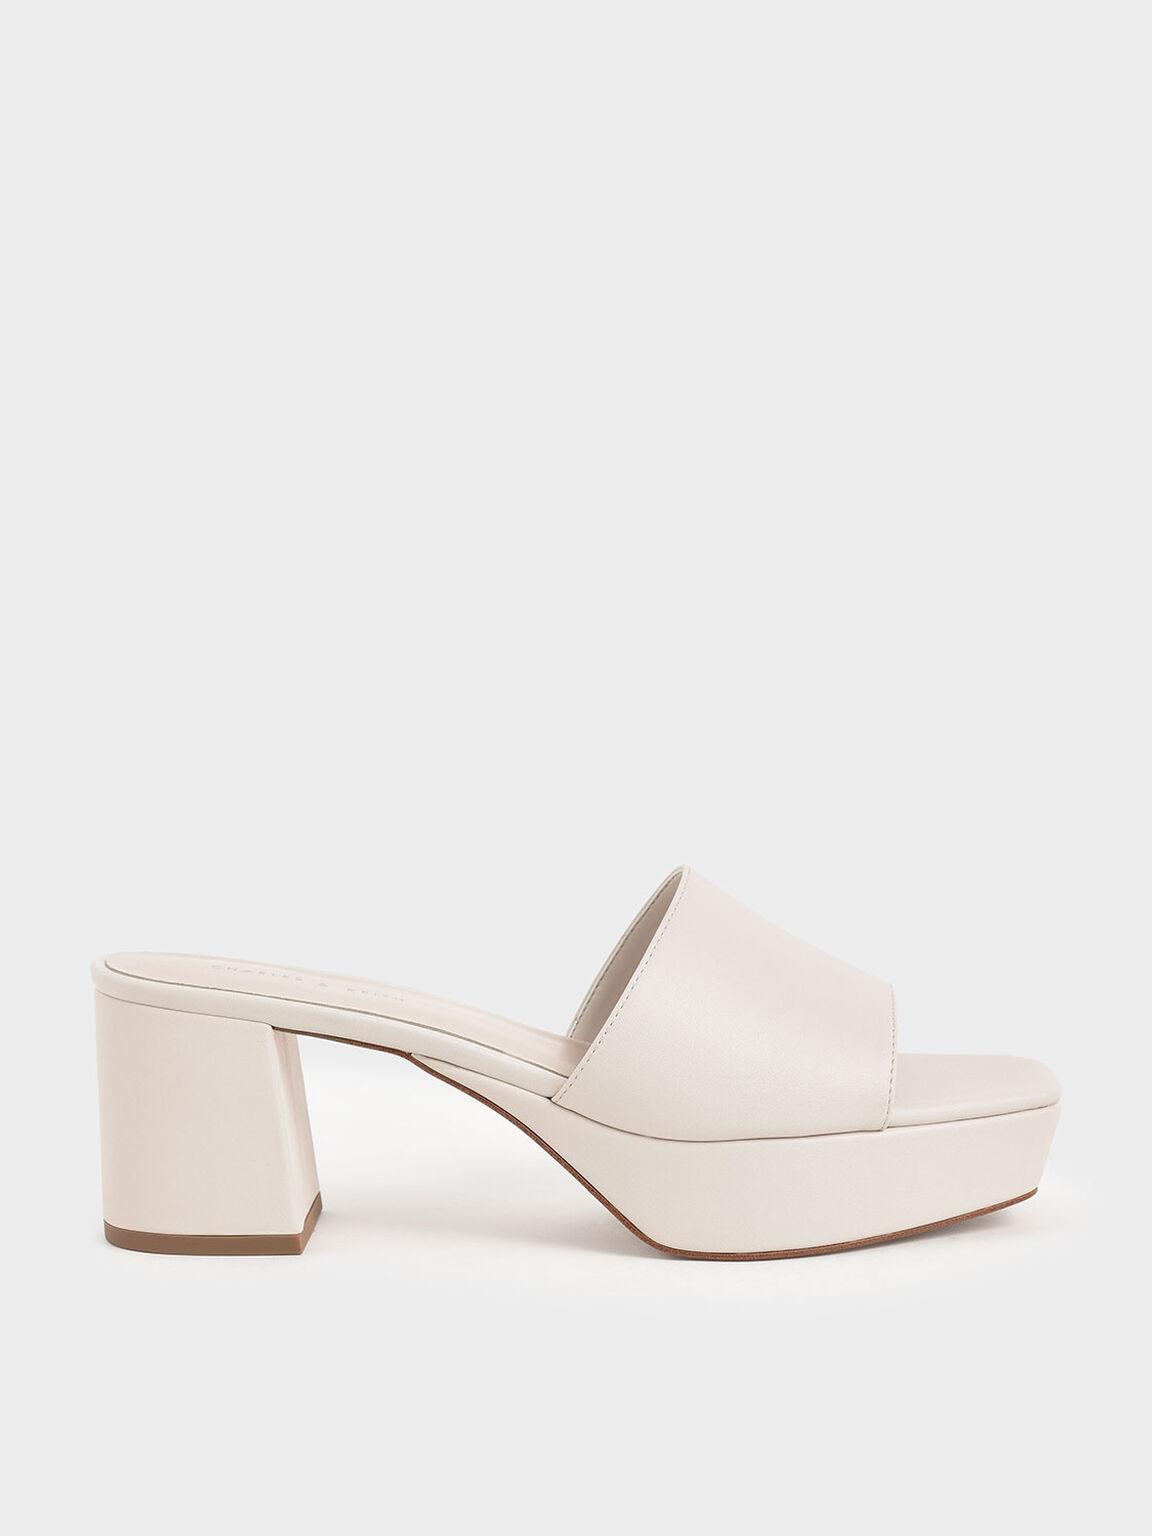 寬面厚底拖鞋, 石灰白, hi-res